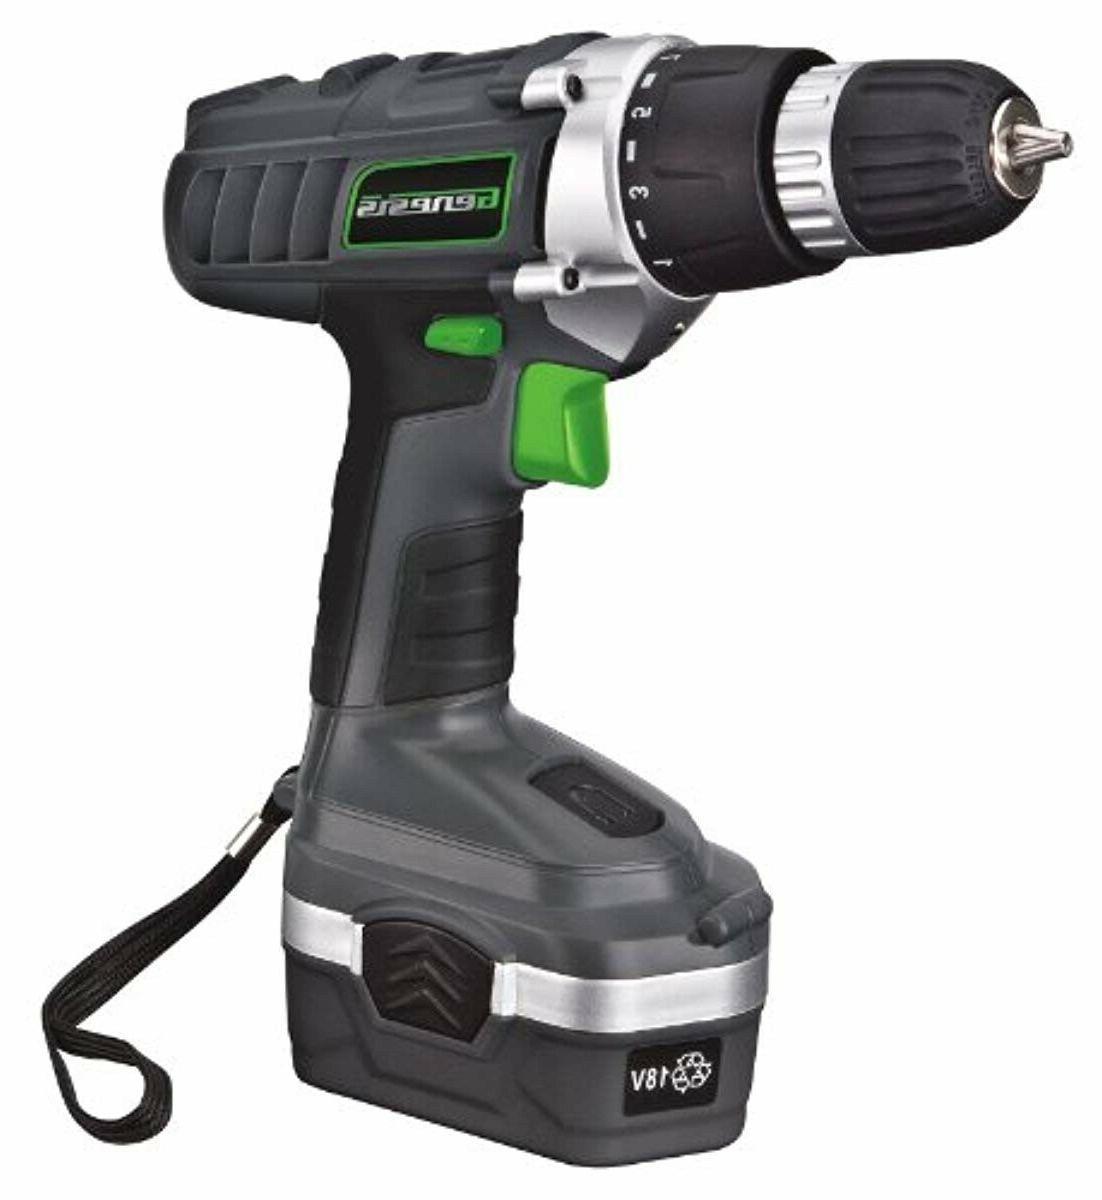 gcd18bk 18 volt cordless variable speed drill